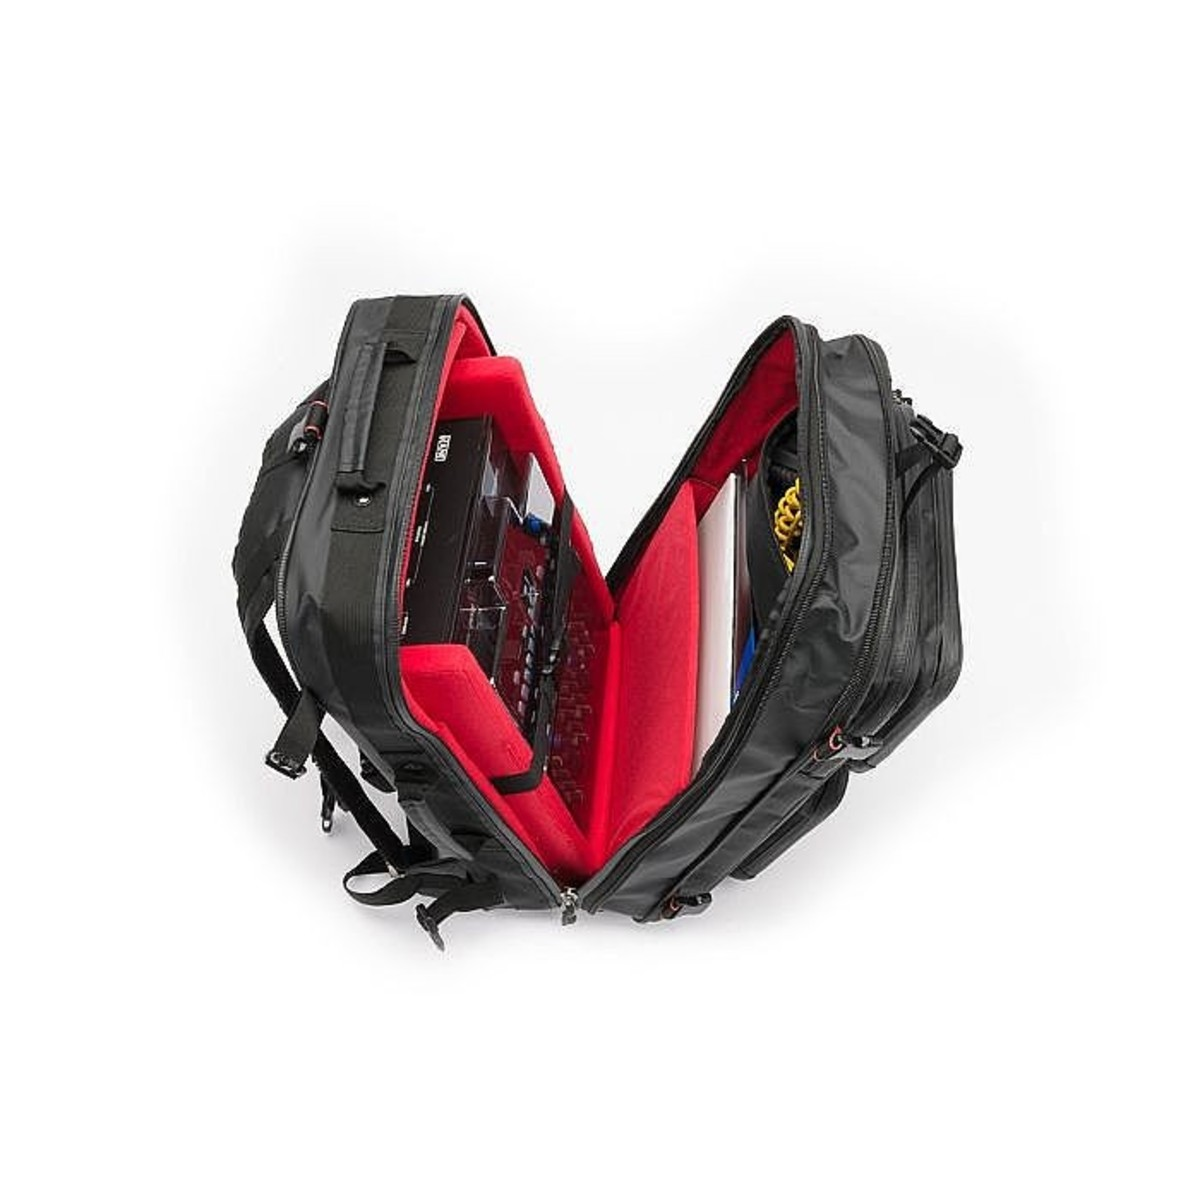 Magma Riot DJ Backpack XL en Gear4Music.com